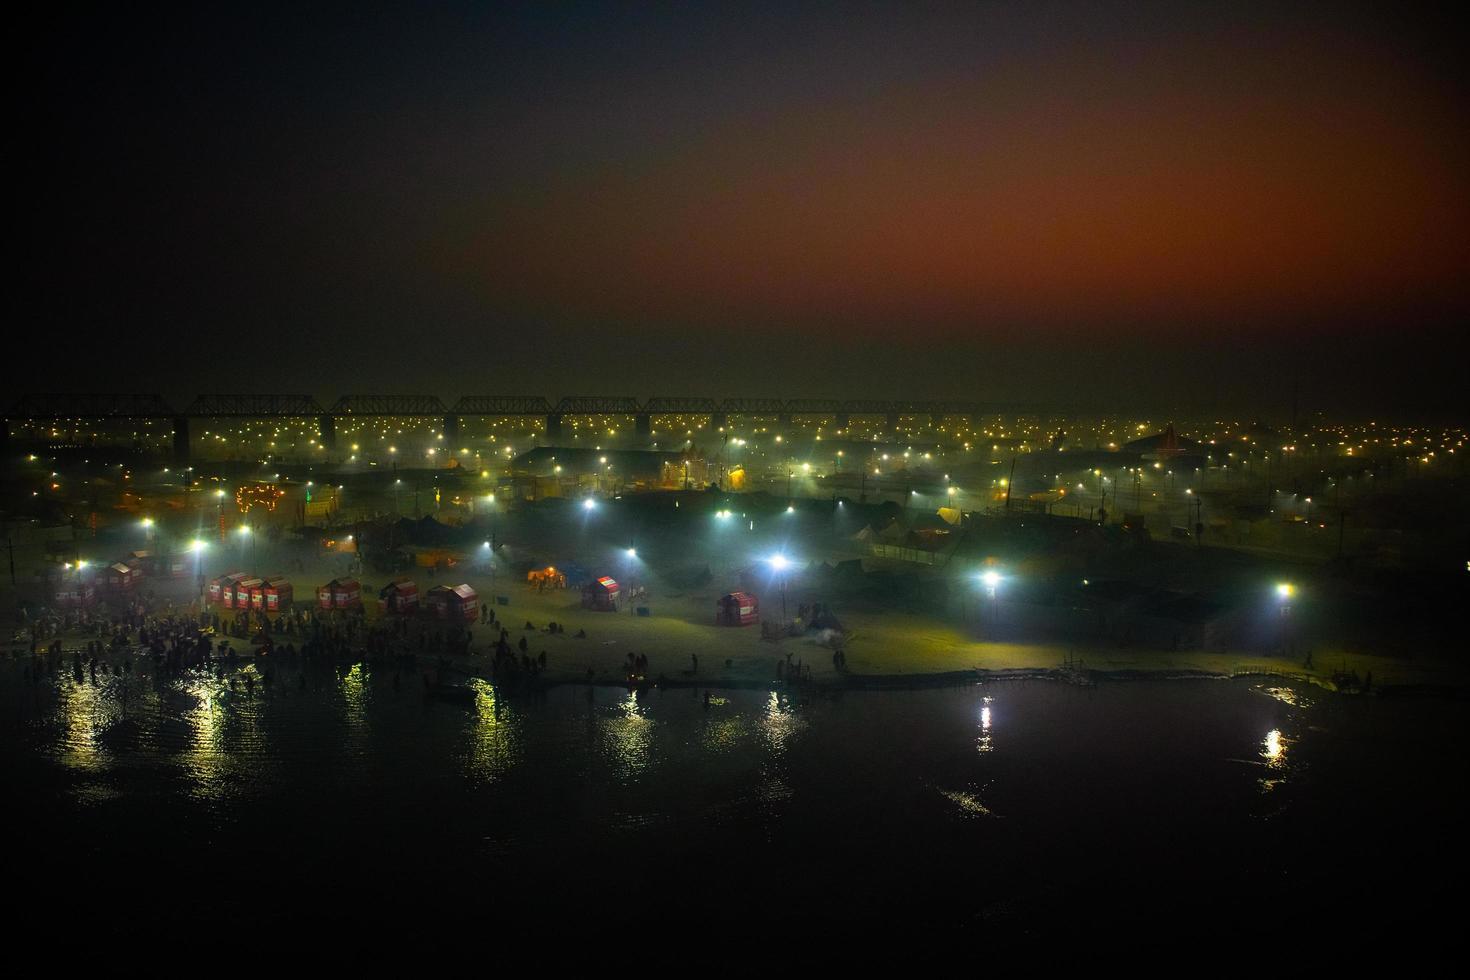 Pragagraj, Indien 2019 - gyllene soluppgången över Kumbh-festivalen foto